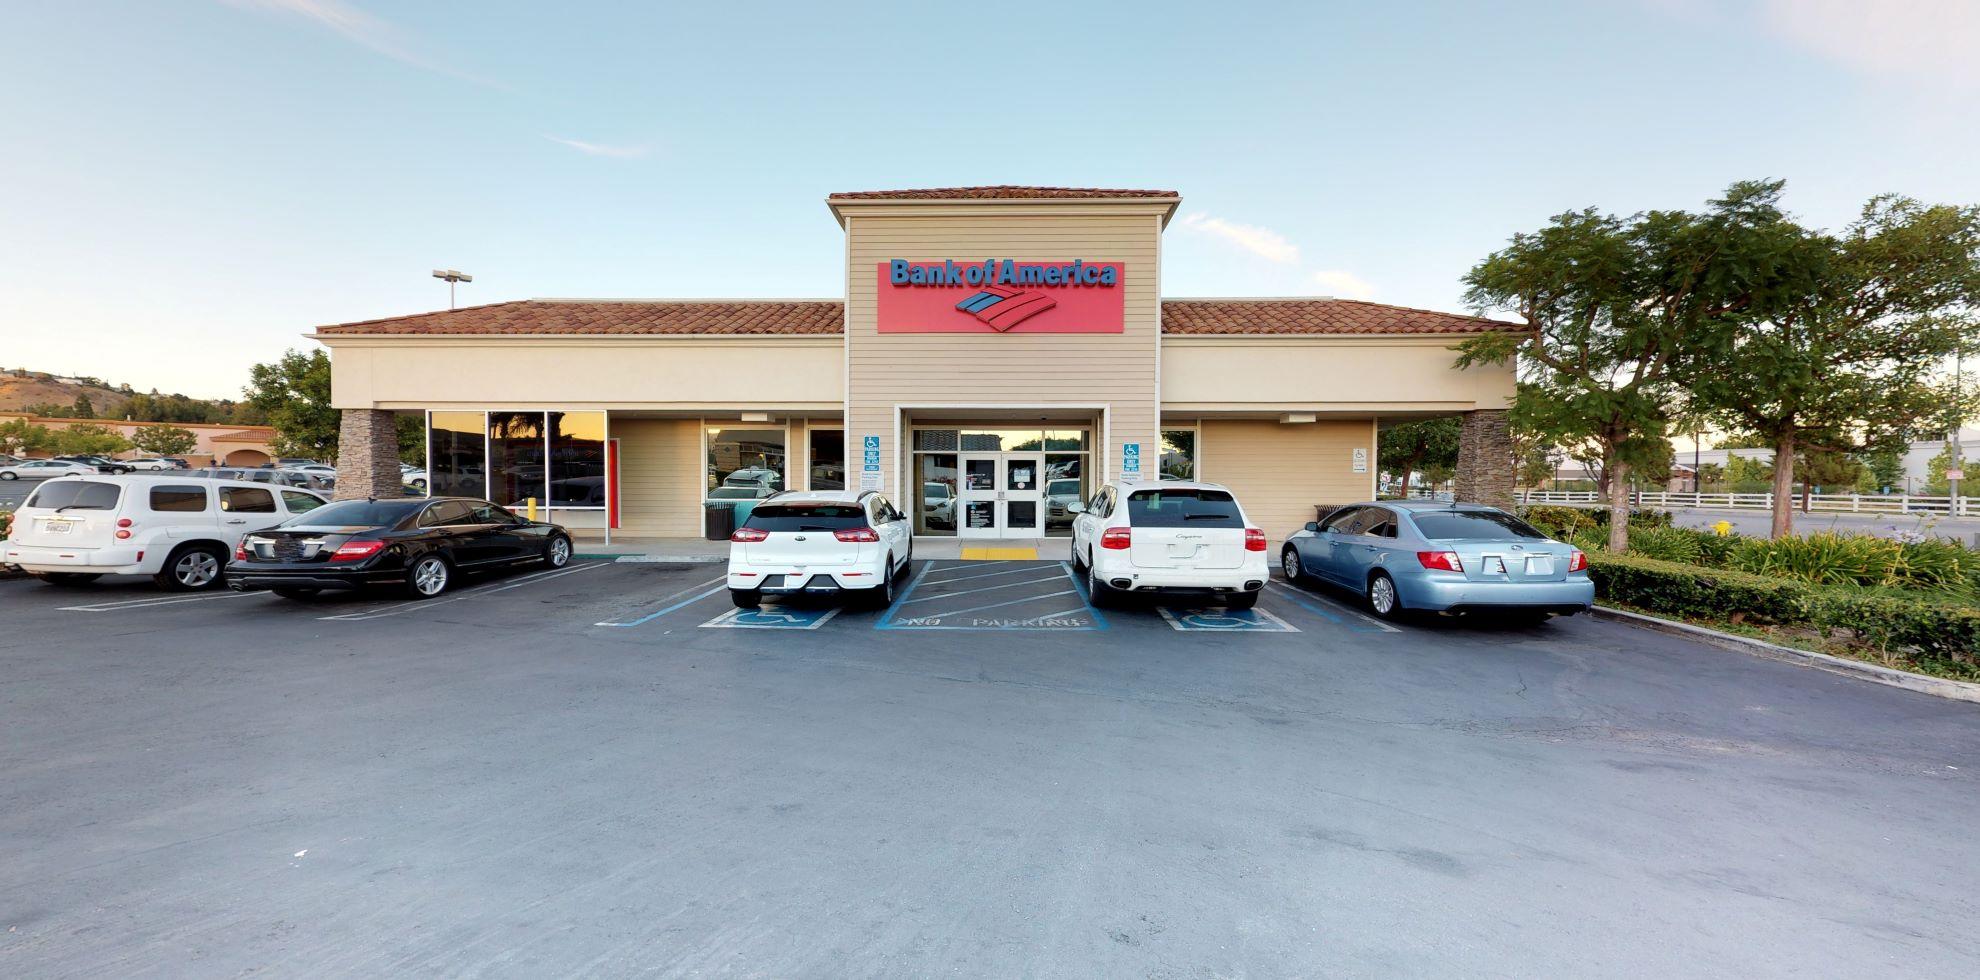 Bank of America financial center with walk-up ATM | 19789 Rinaldi St, Northridge, CA 91326